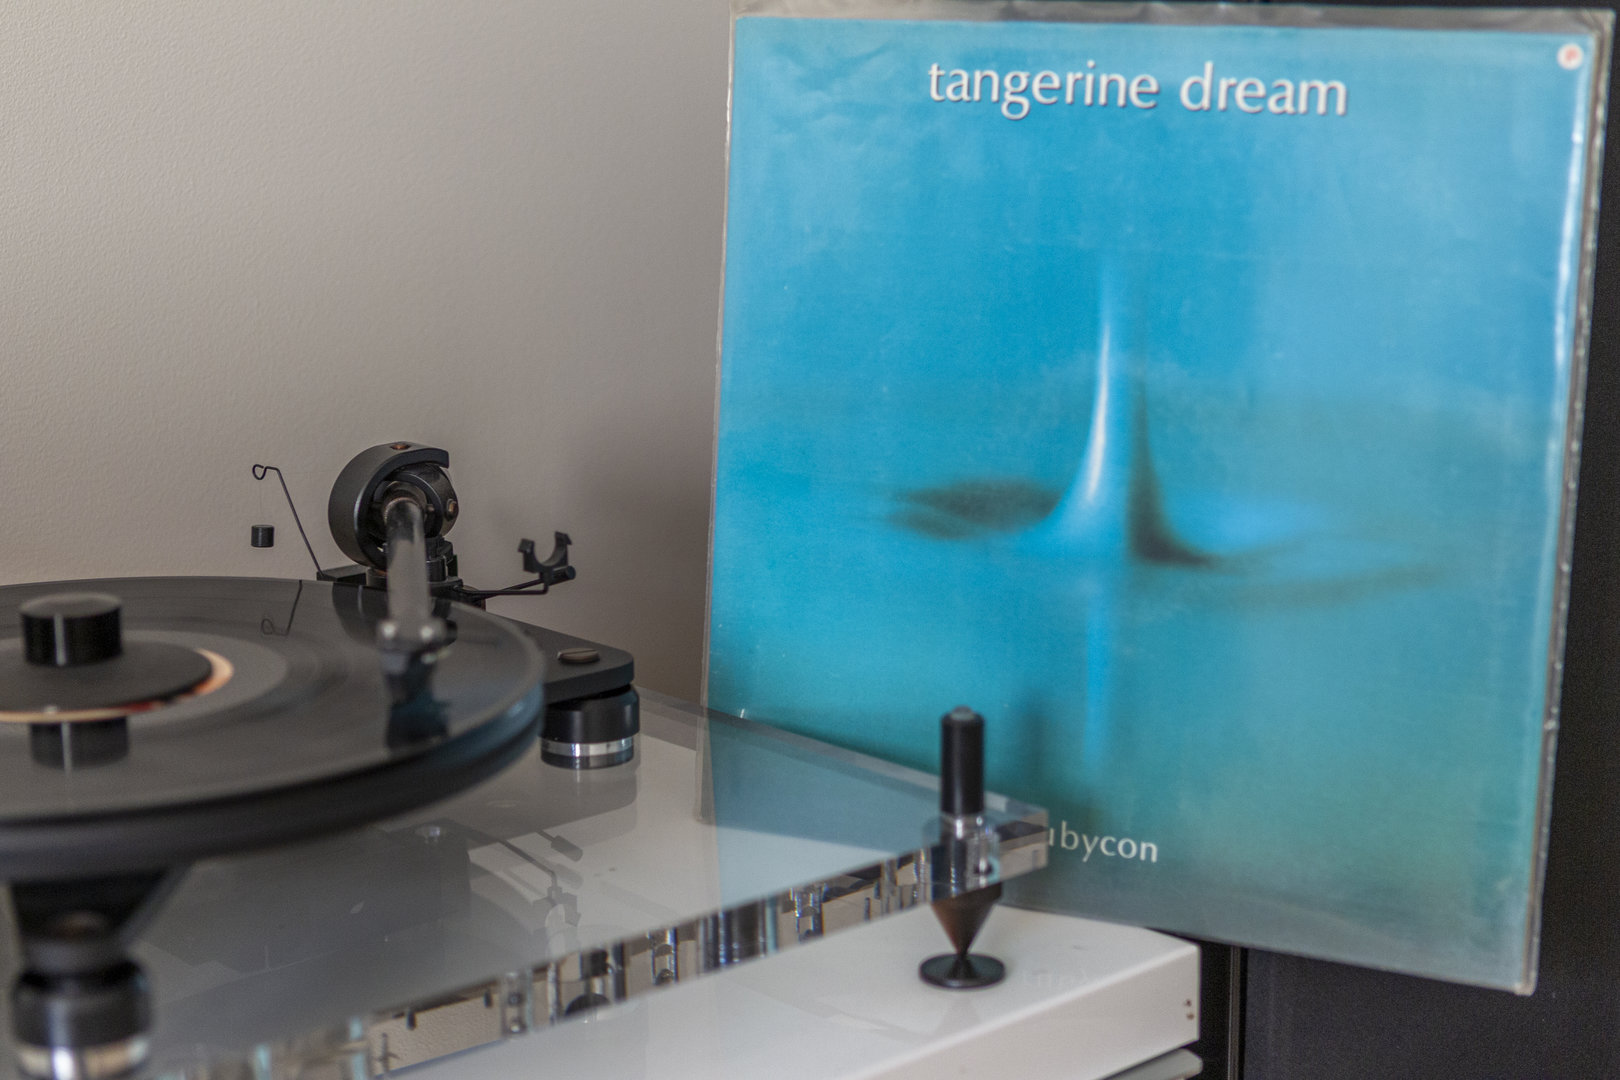 20210811 Tangerine Dream rubycon 1975.jpg